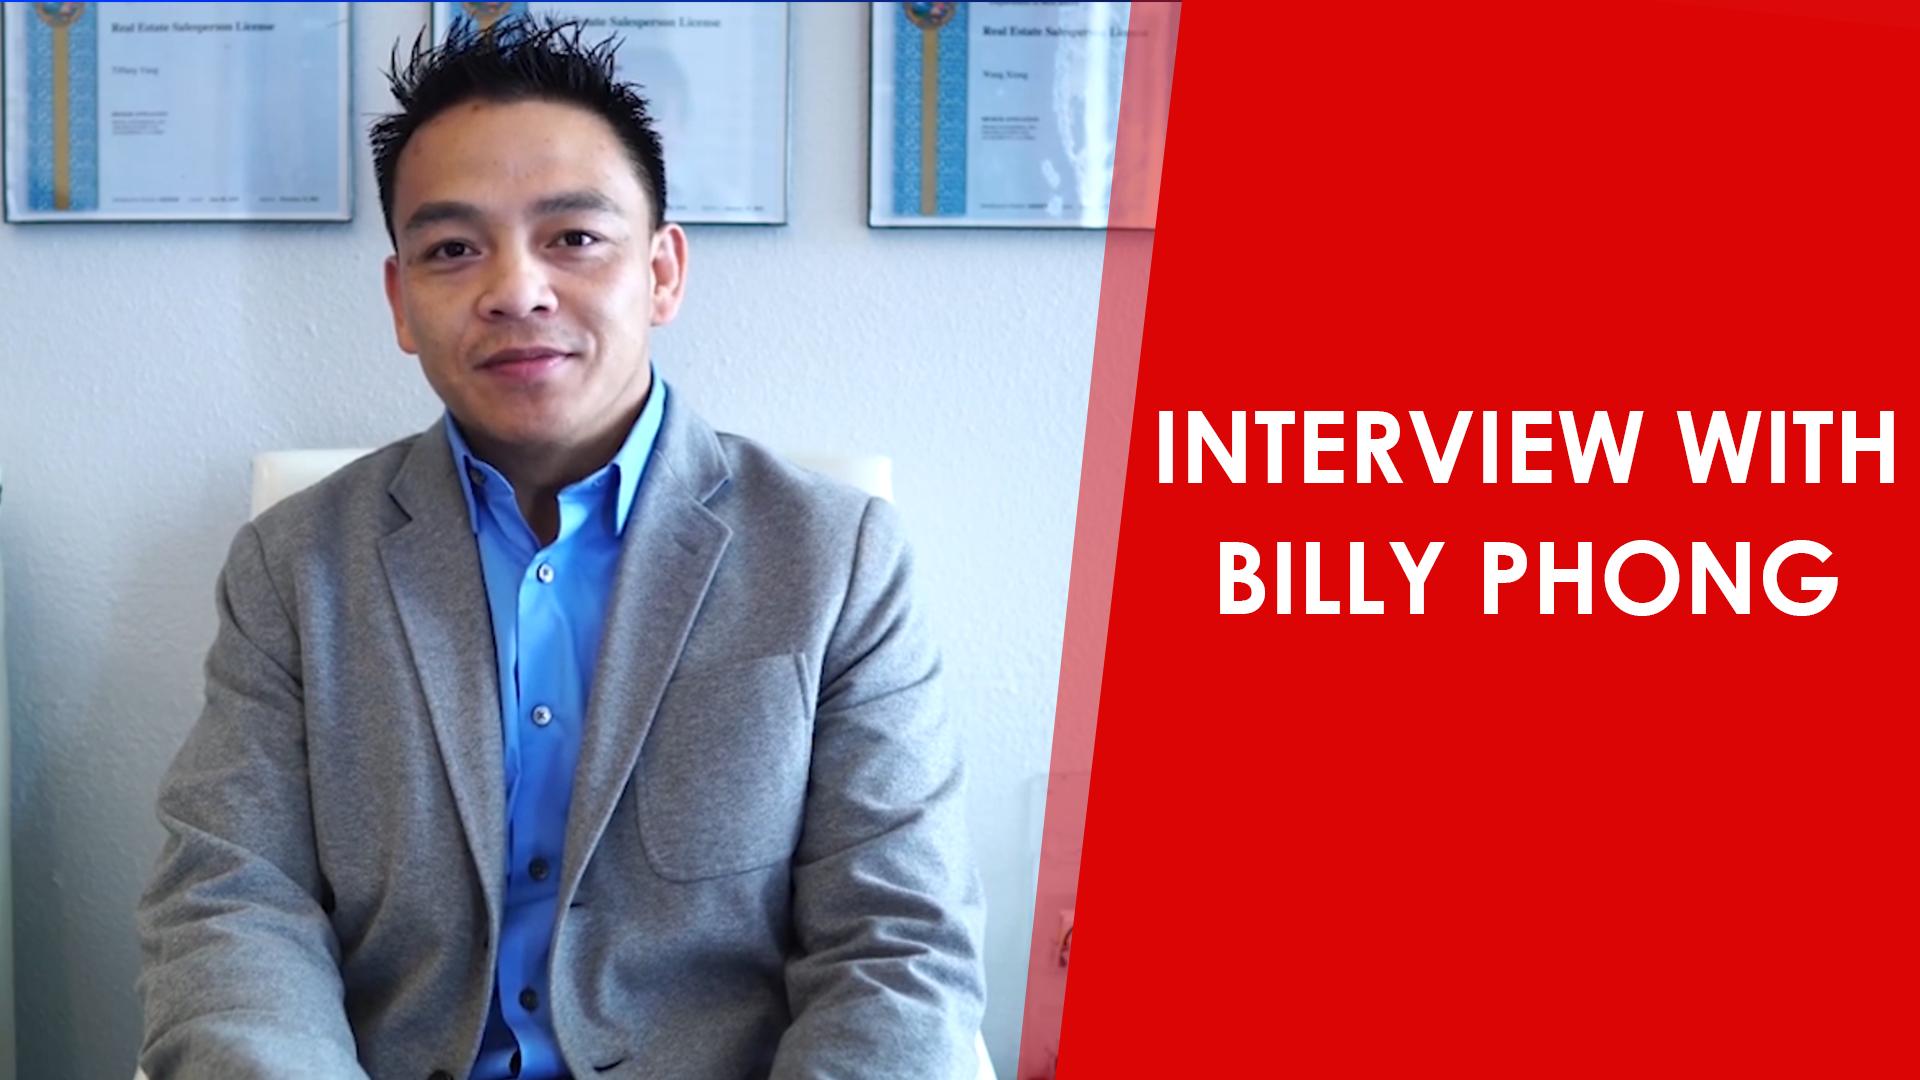 Spotlighting Billy Phong, Head of the HP Real Estate Team